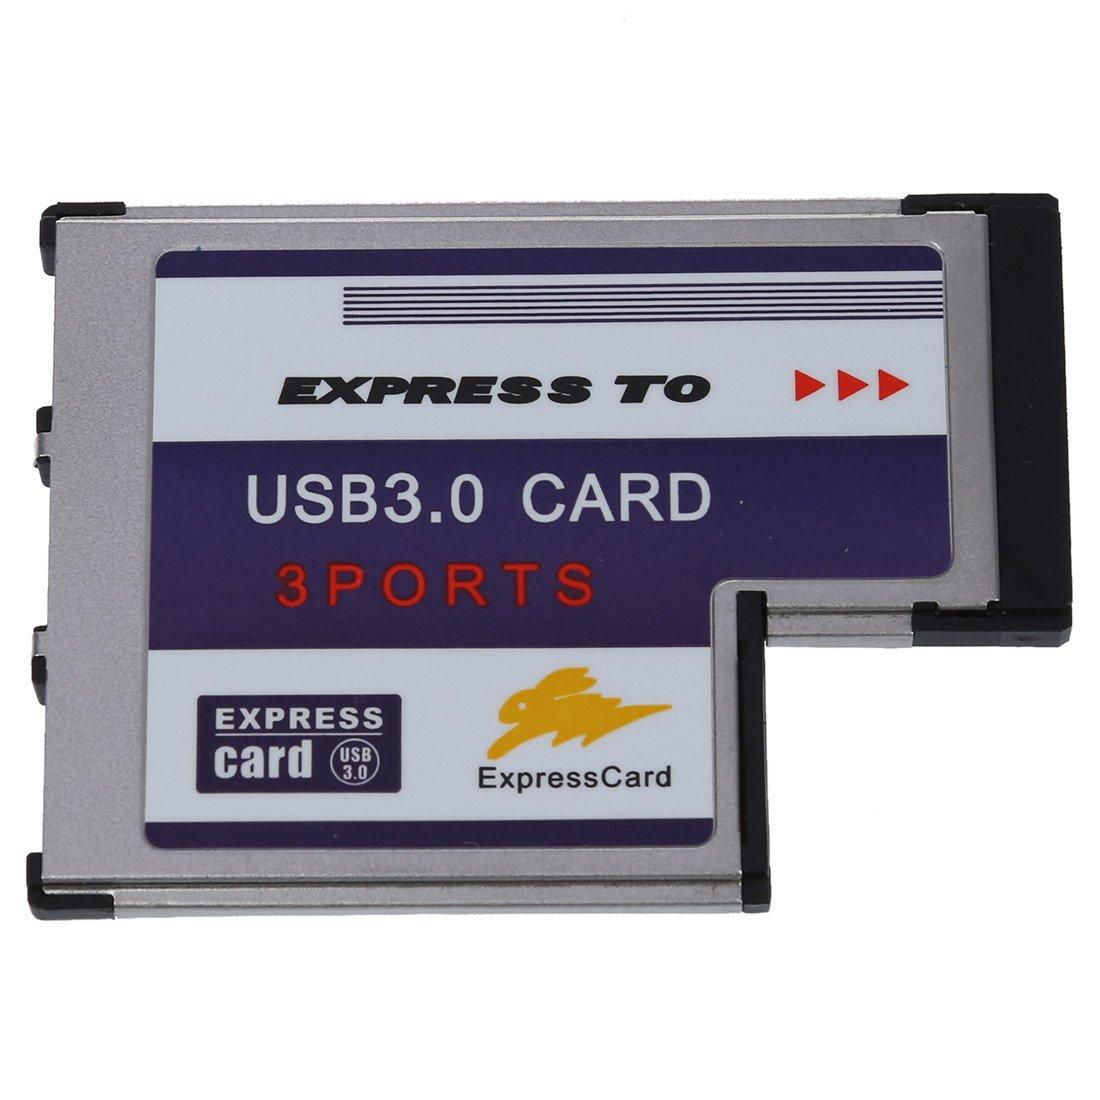 TOOGOO(R) 3 USB 3.0 puerto expreso Tarjeta 54mm PCMCIA Express Card para el ordenador portatil NUEVO